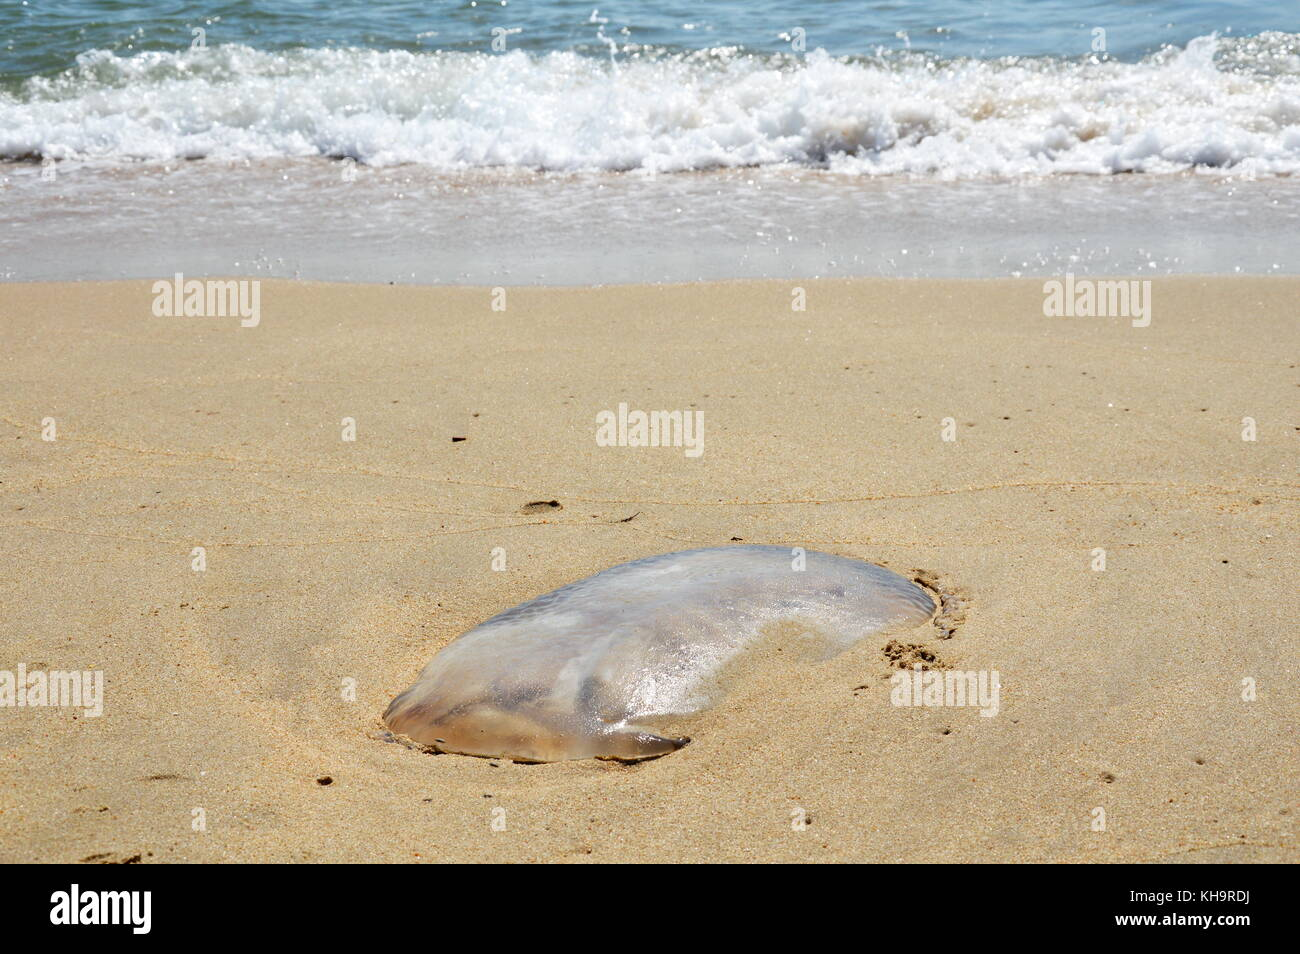 jellyfish strand on the beach - Stock Image